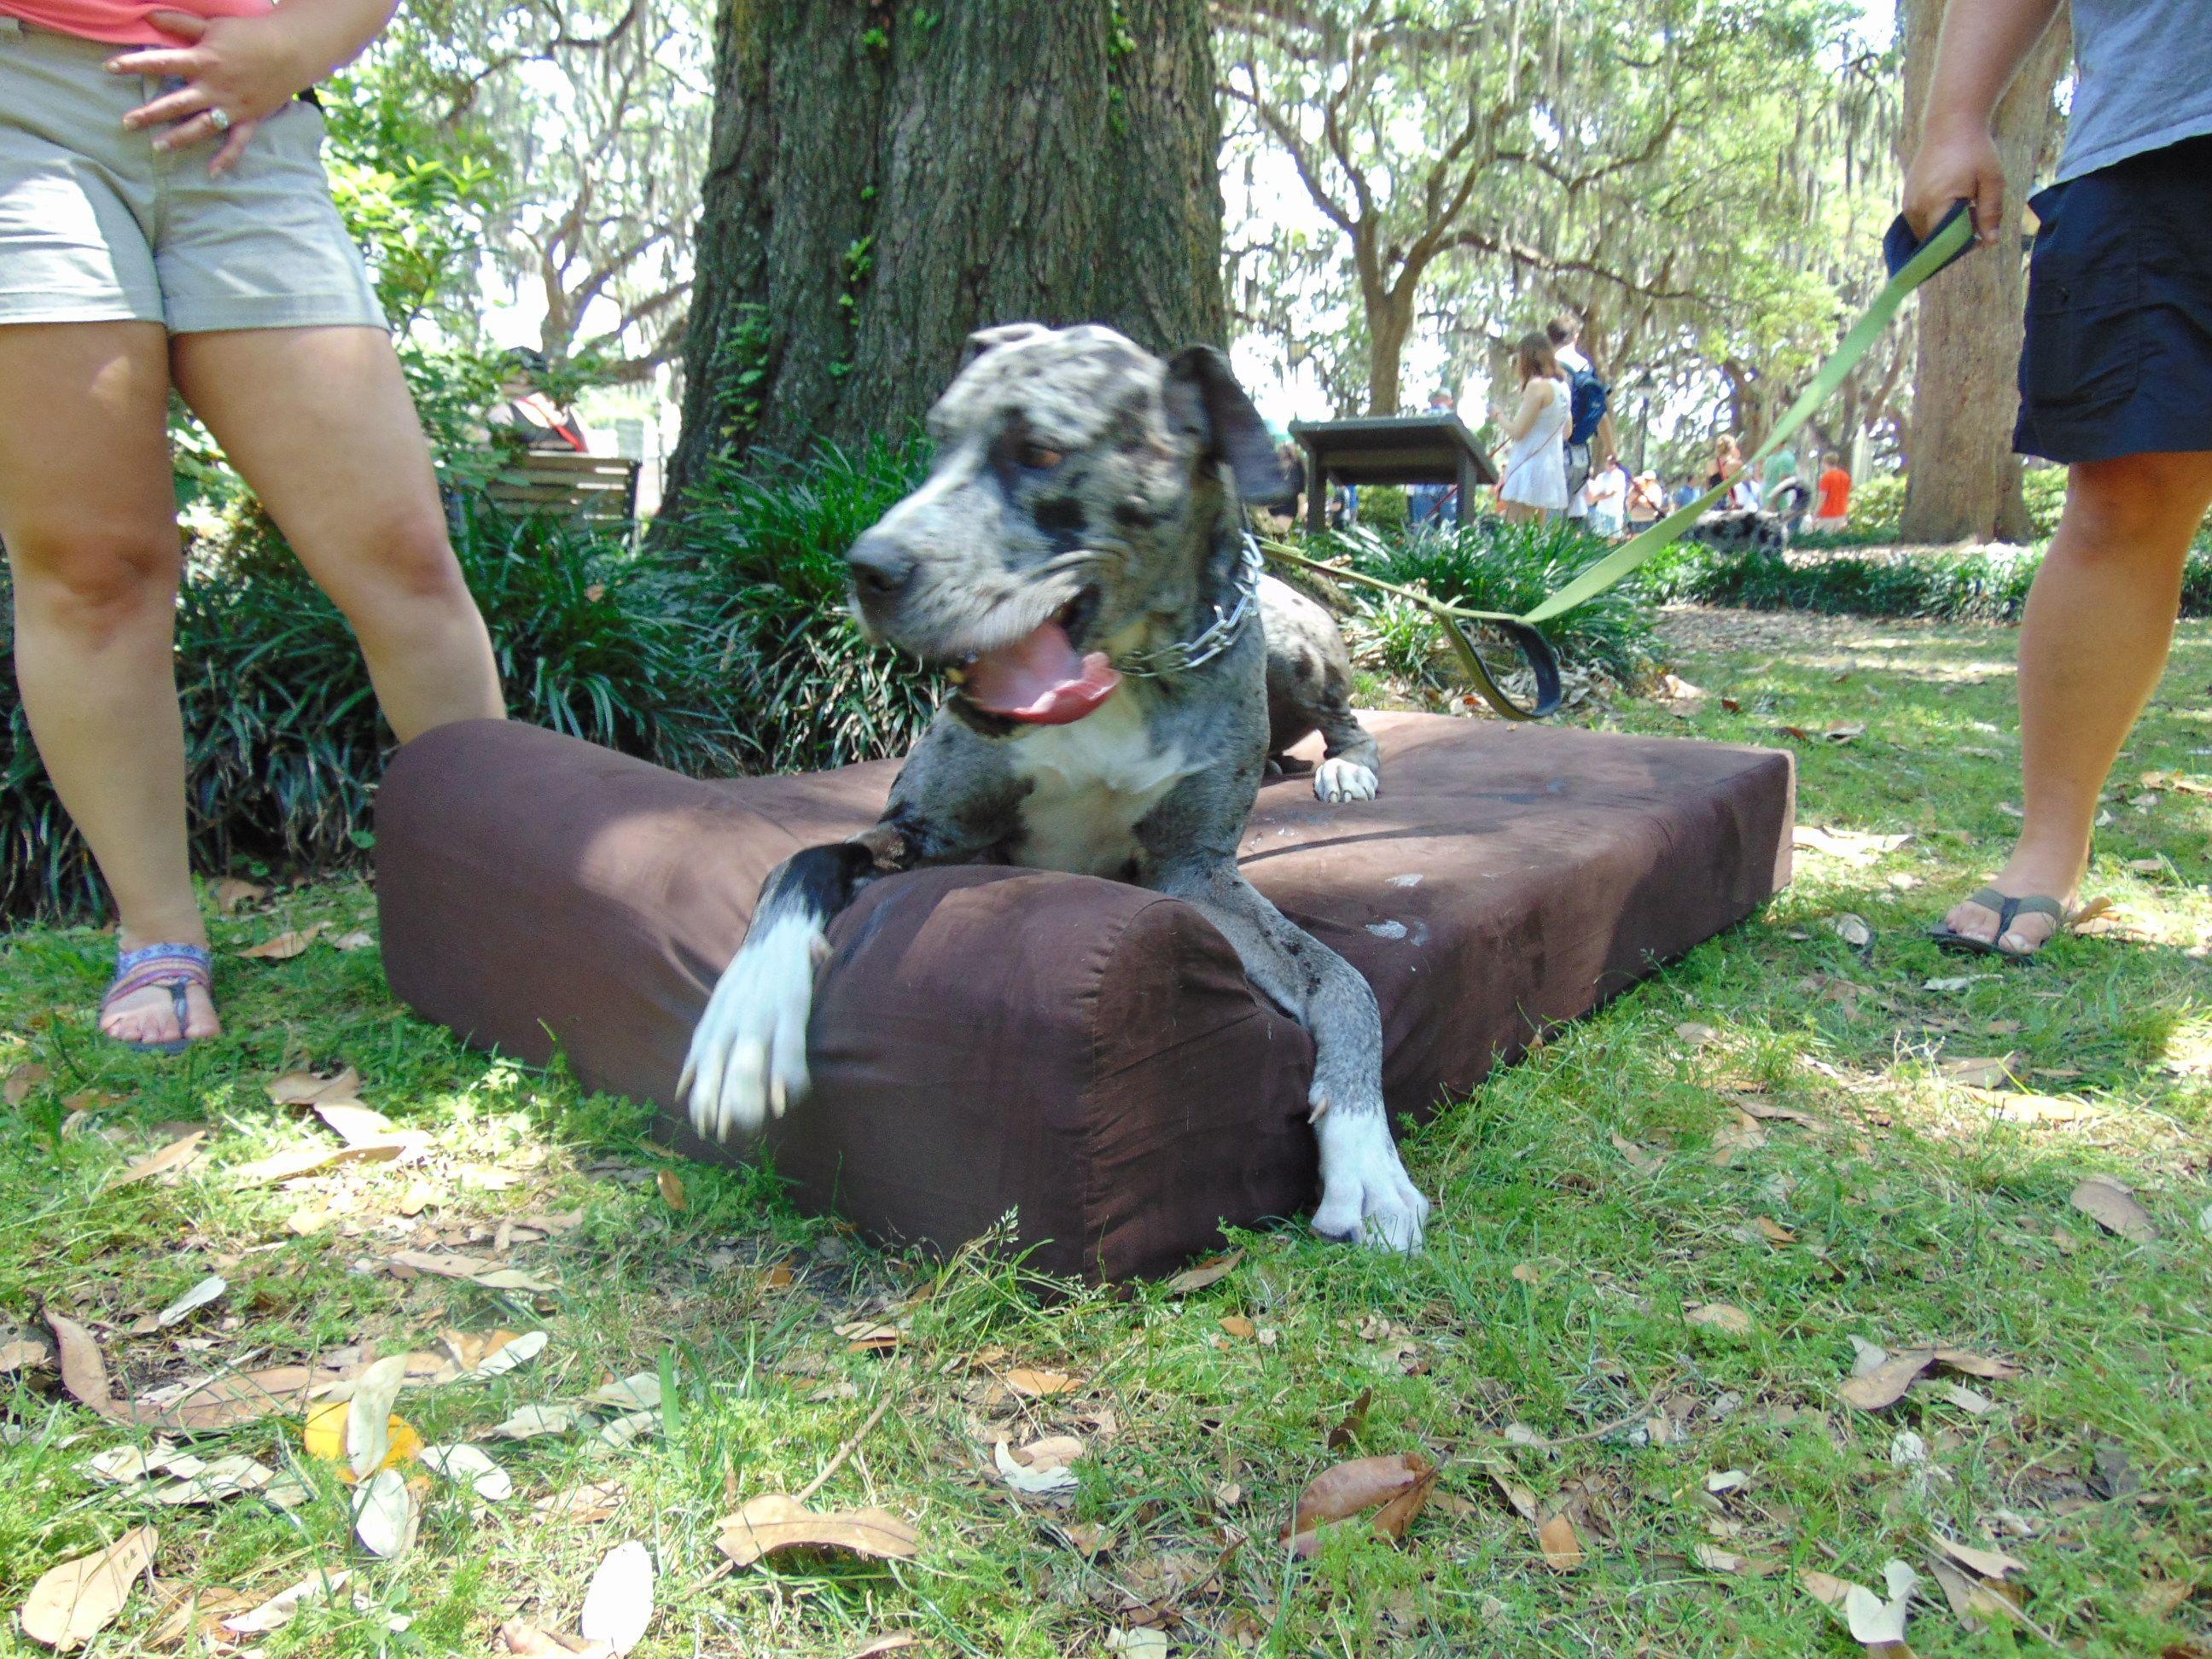 Great Dane Dog Bed Savannah, GA Dog Carnival GoliathPets